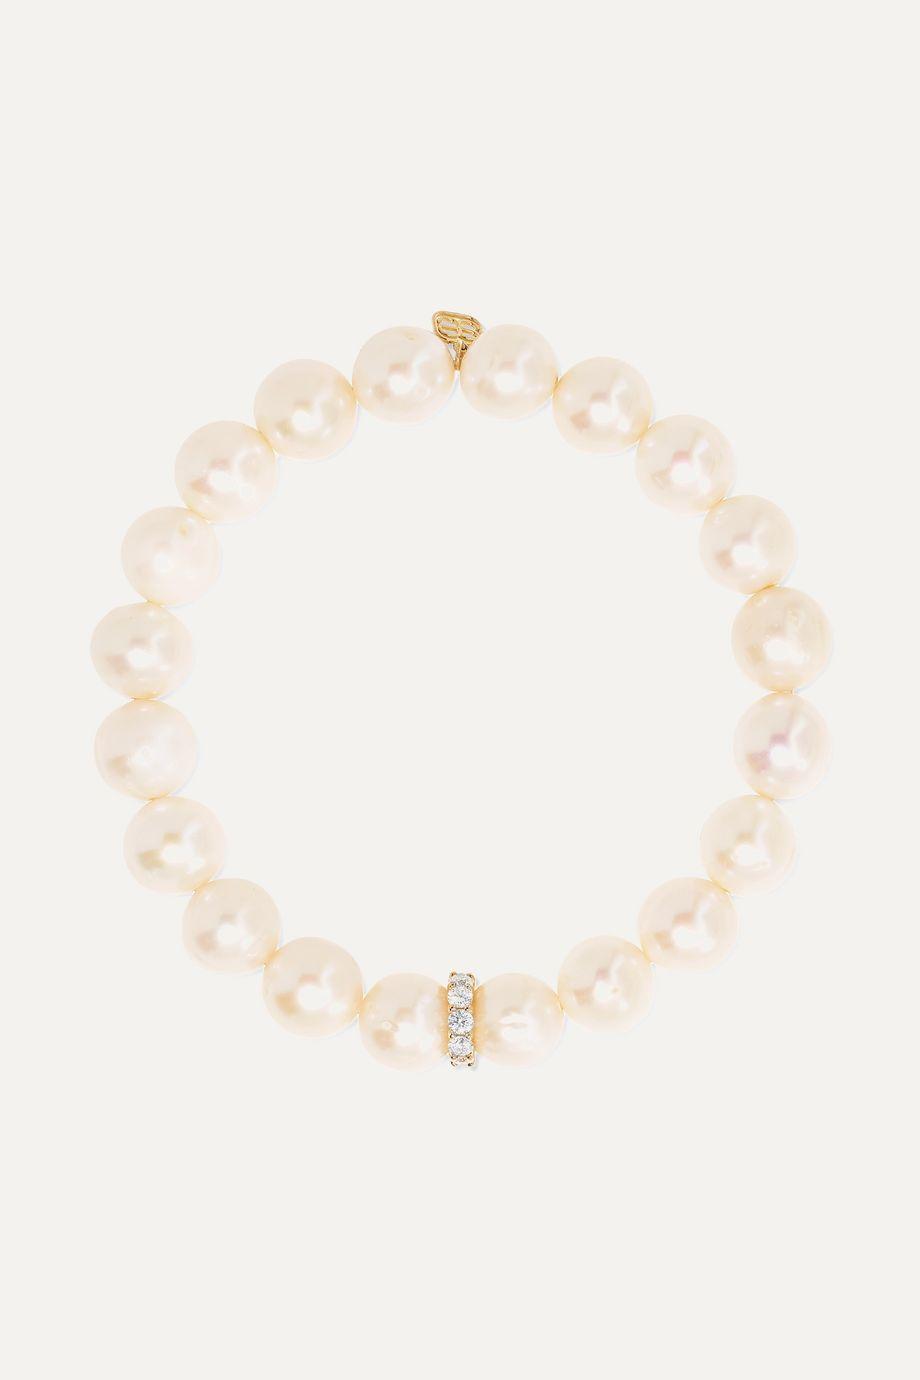 Sydney Evan 14-karat gold, pearl and diamond bracelet